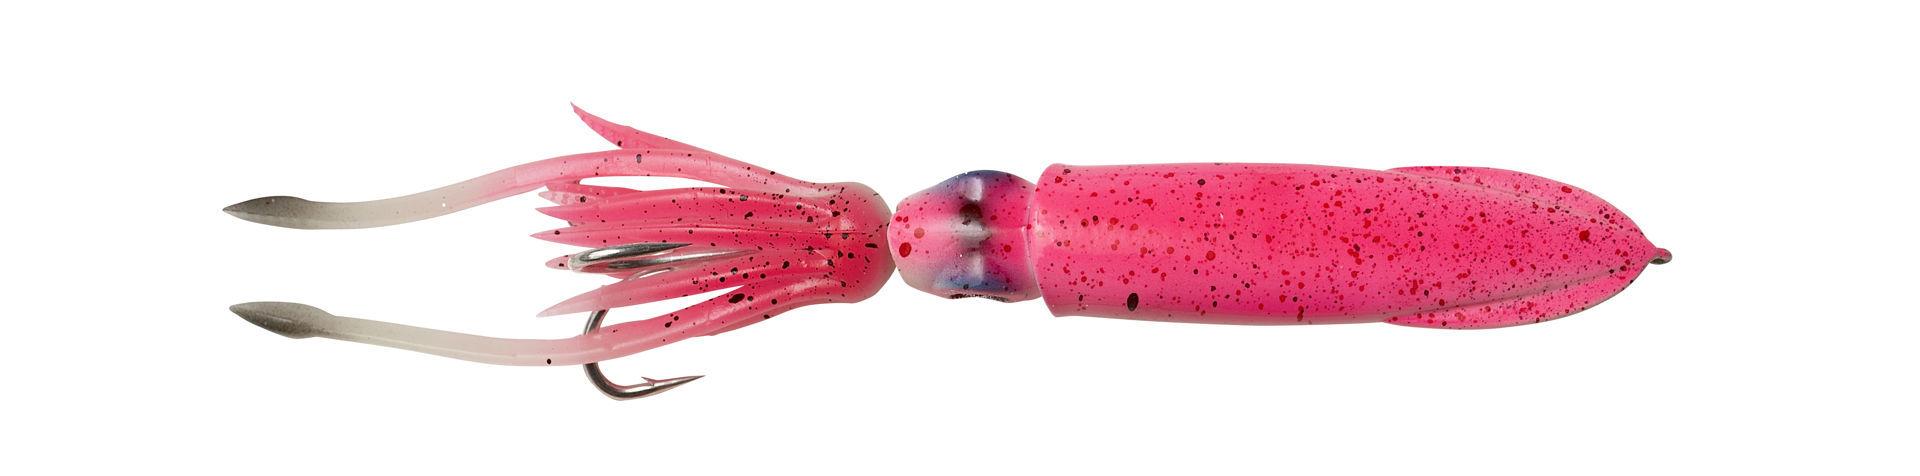 Bilde av Savage Gear 3D Swim Squid Jig Pink Glow pilk